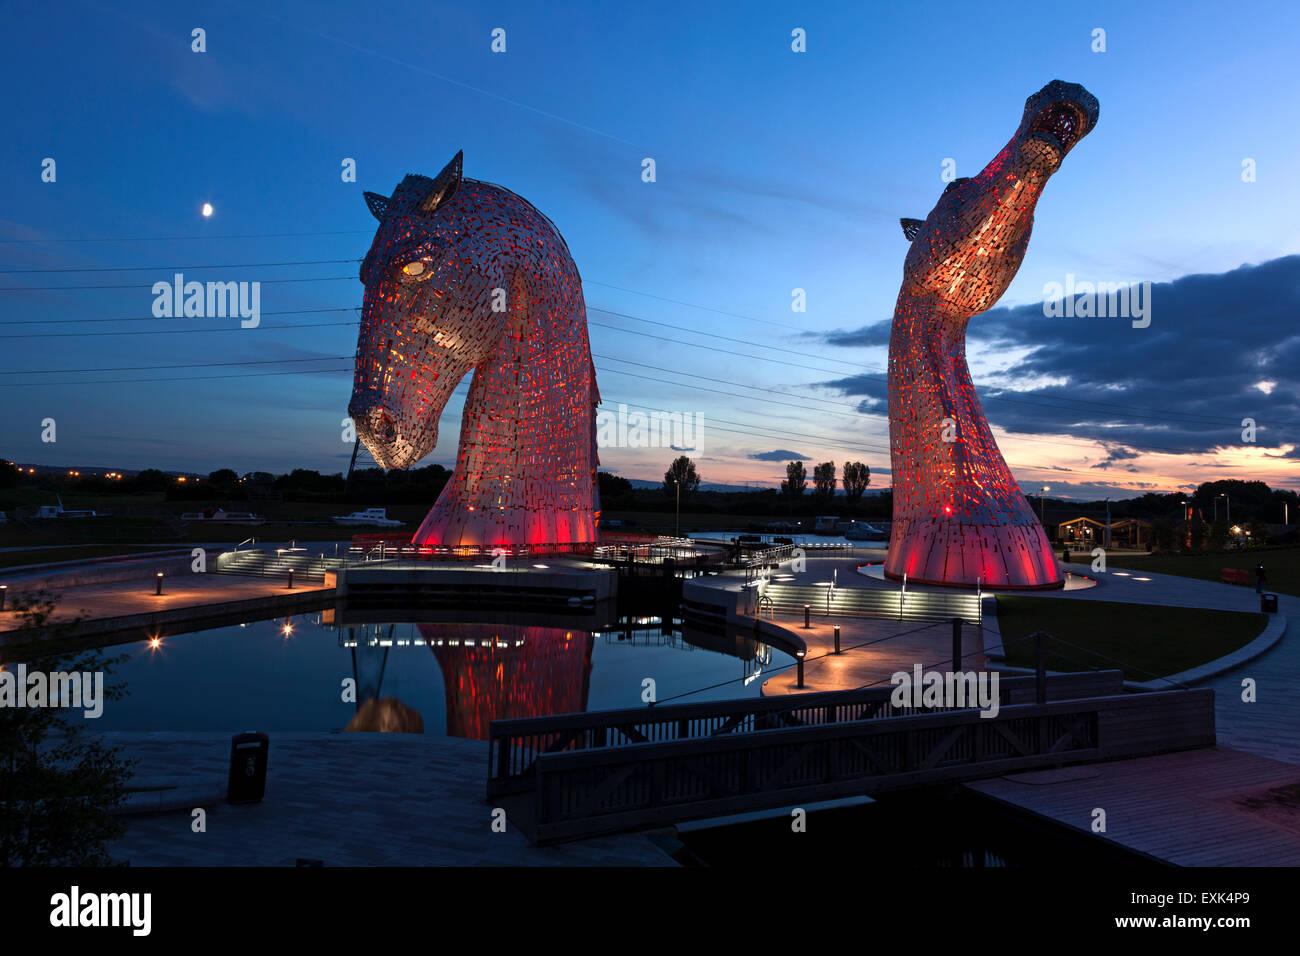 the-kelpies-sculpture-illuminated-at-night-falkirk-stirling-EXK4P9.jpg